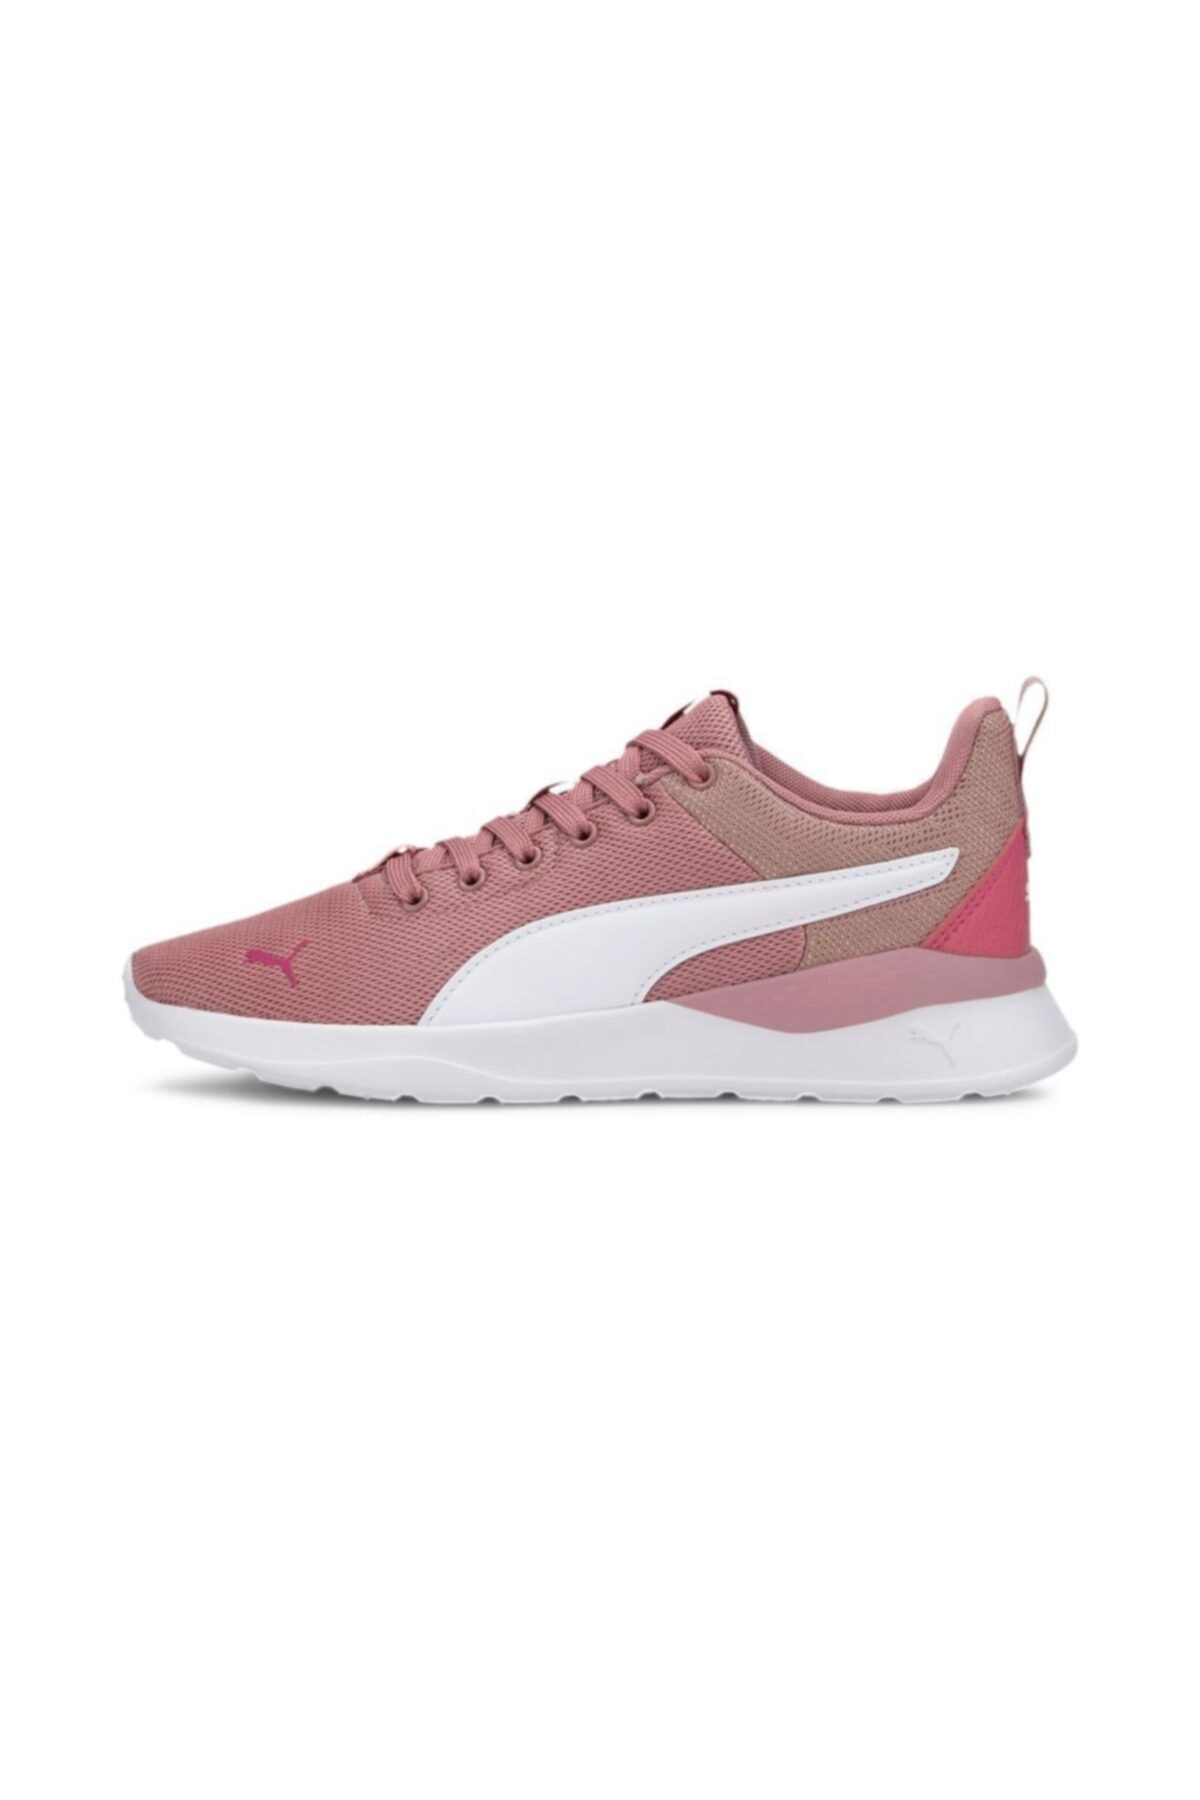 Puma 373174 01 Anzarun Lite Metallic Jr Kadın Sneaker Ayakkabı Pembe 1